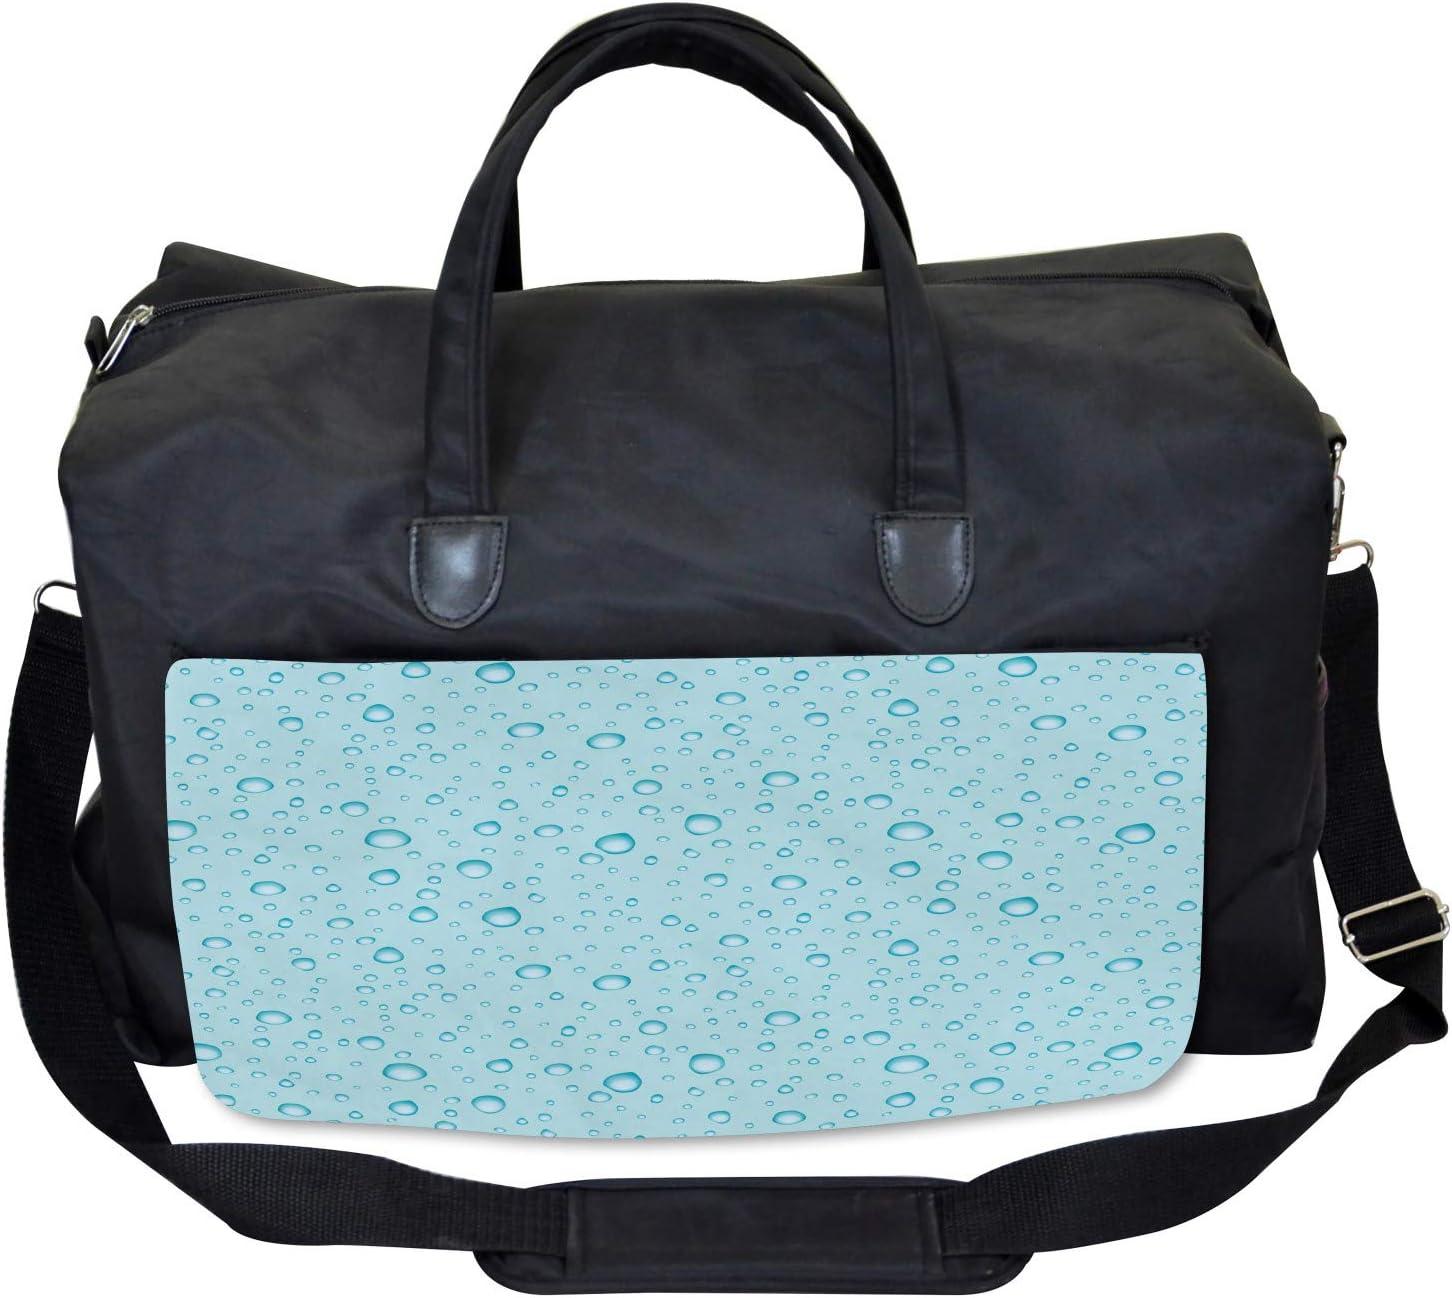 Ambesonne Aqua Gym Bag Water Drops Oceanic Naval Large Weekender Carry-on